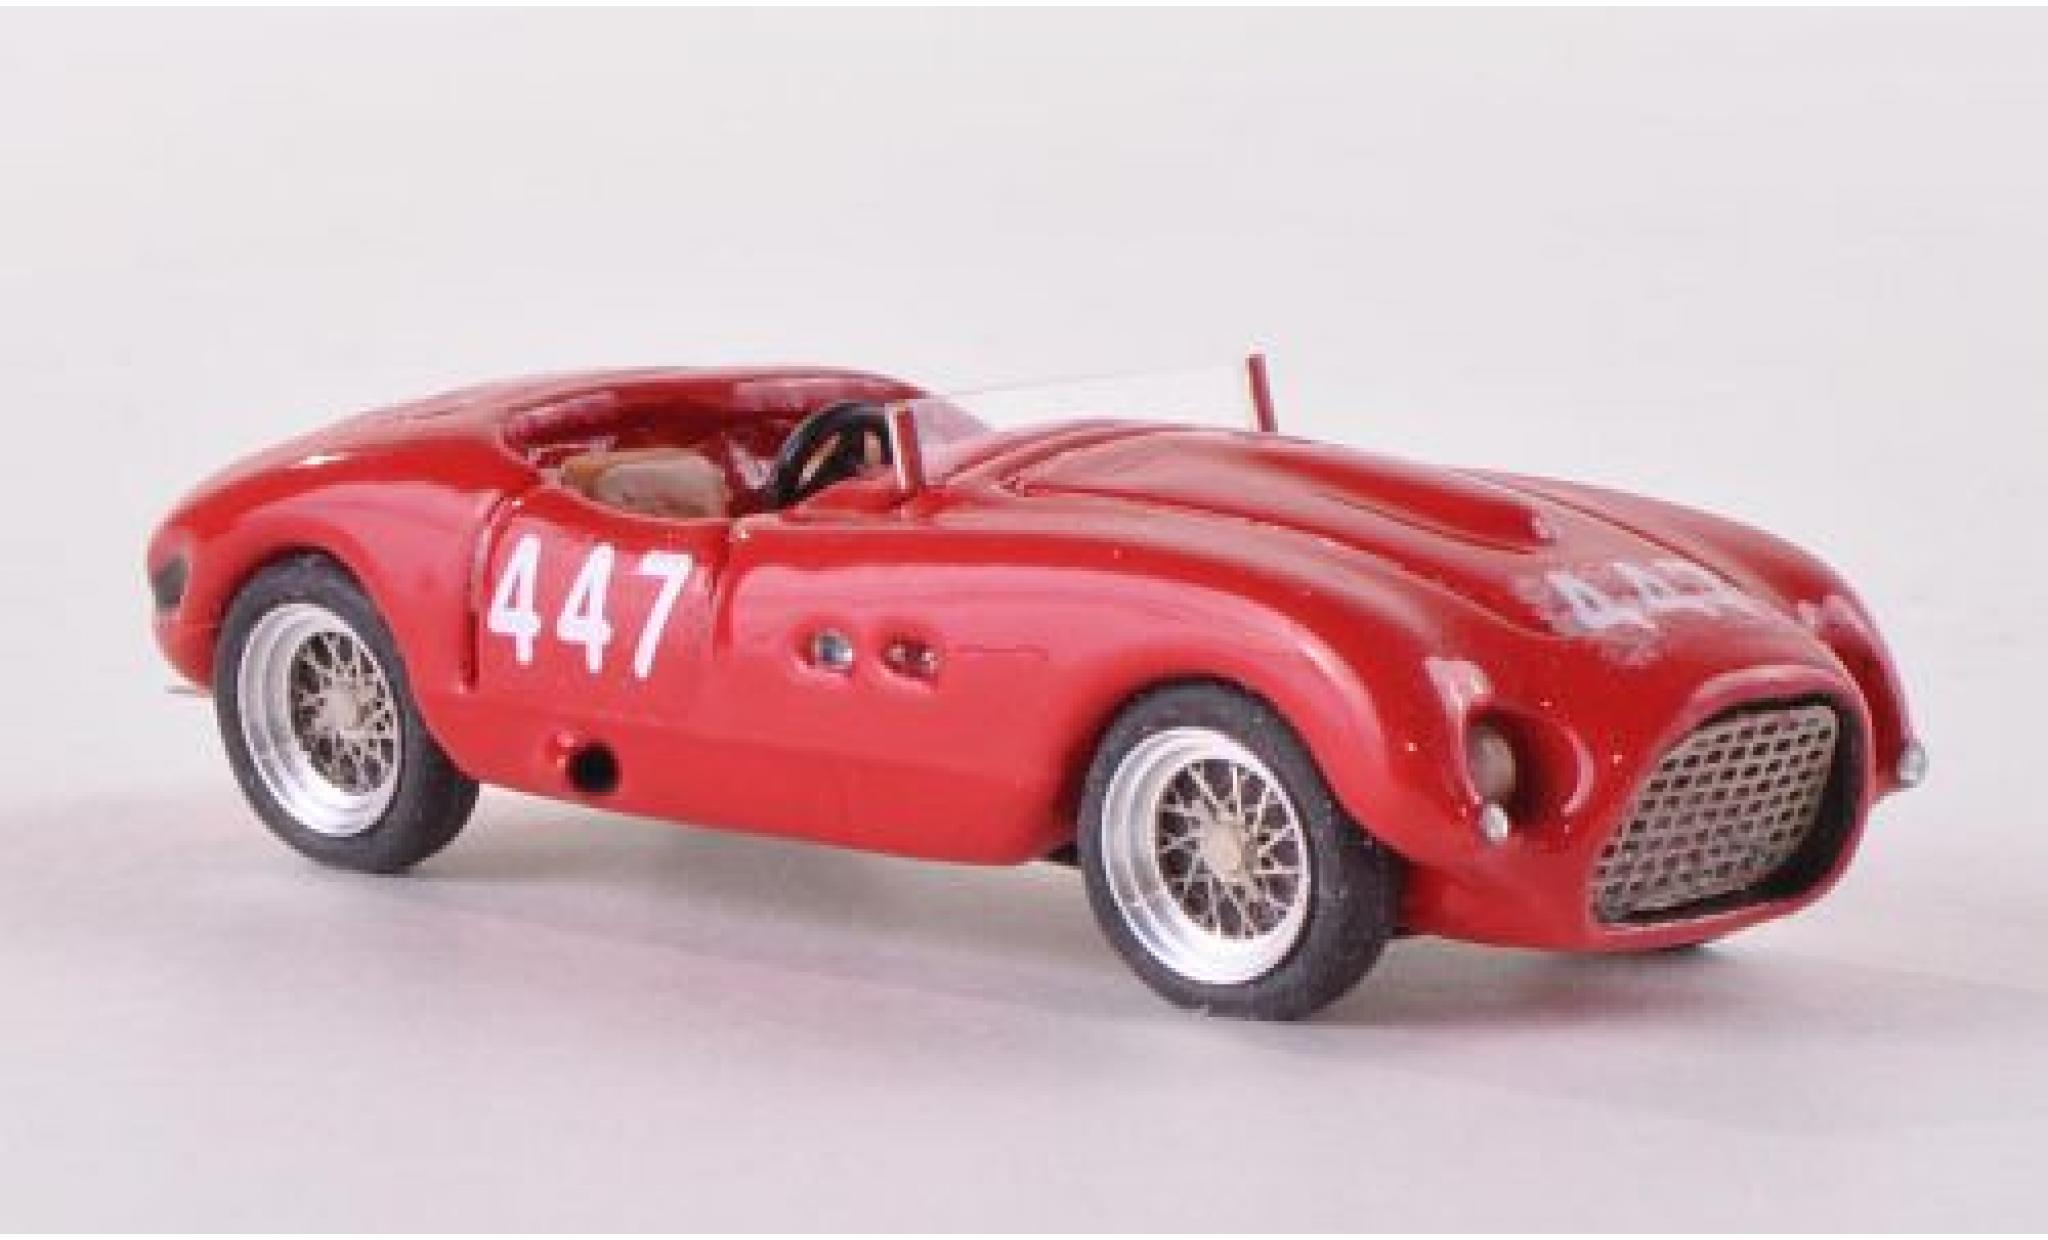 Ferrari 250 1/87 Jolly Model MM No.447 Targa Florio 1953